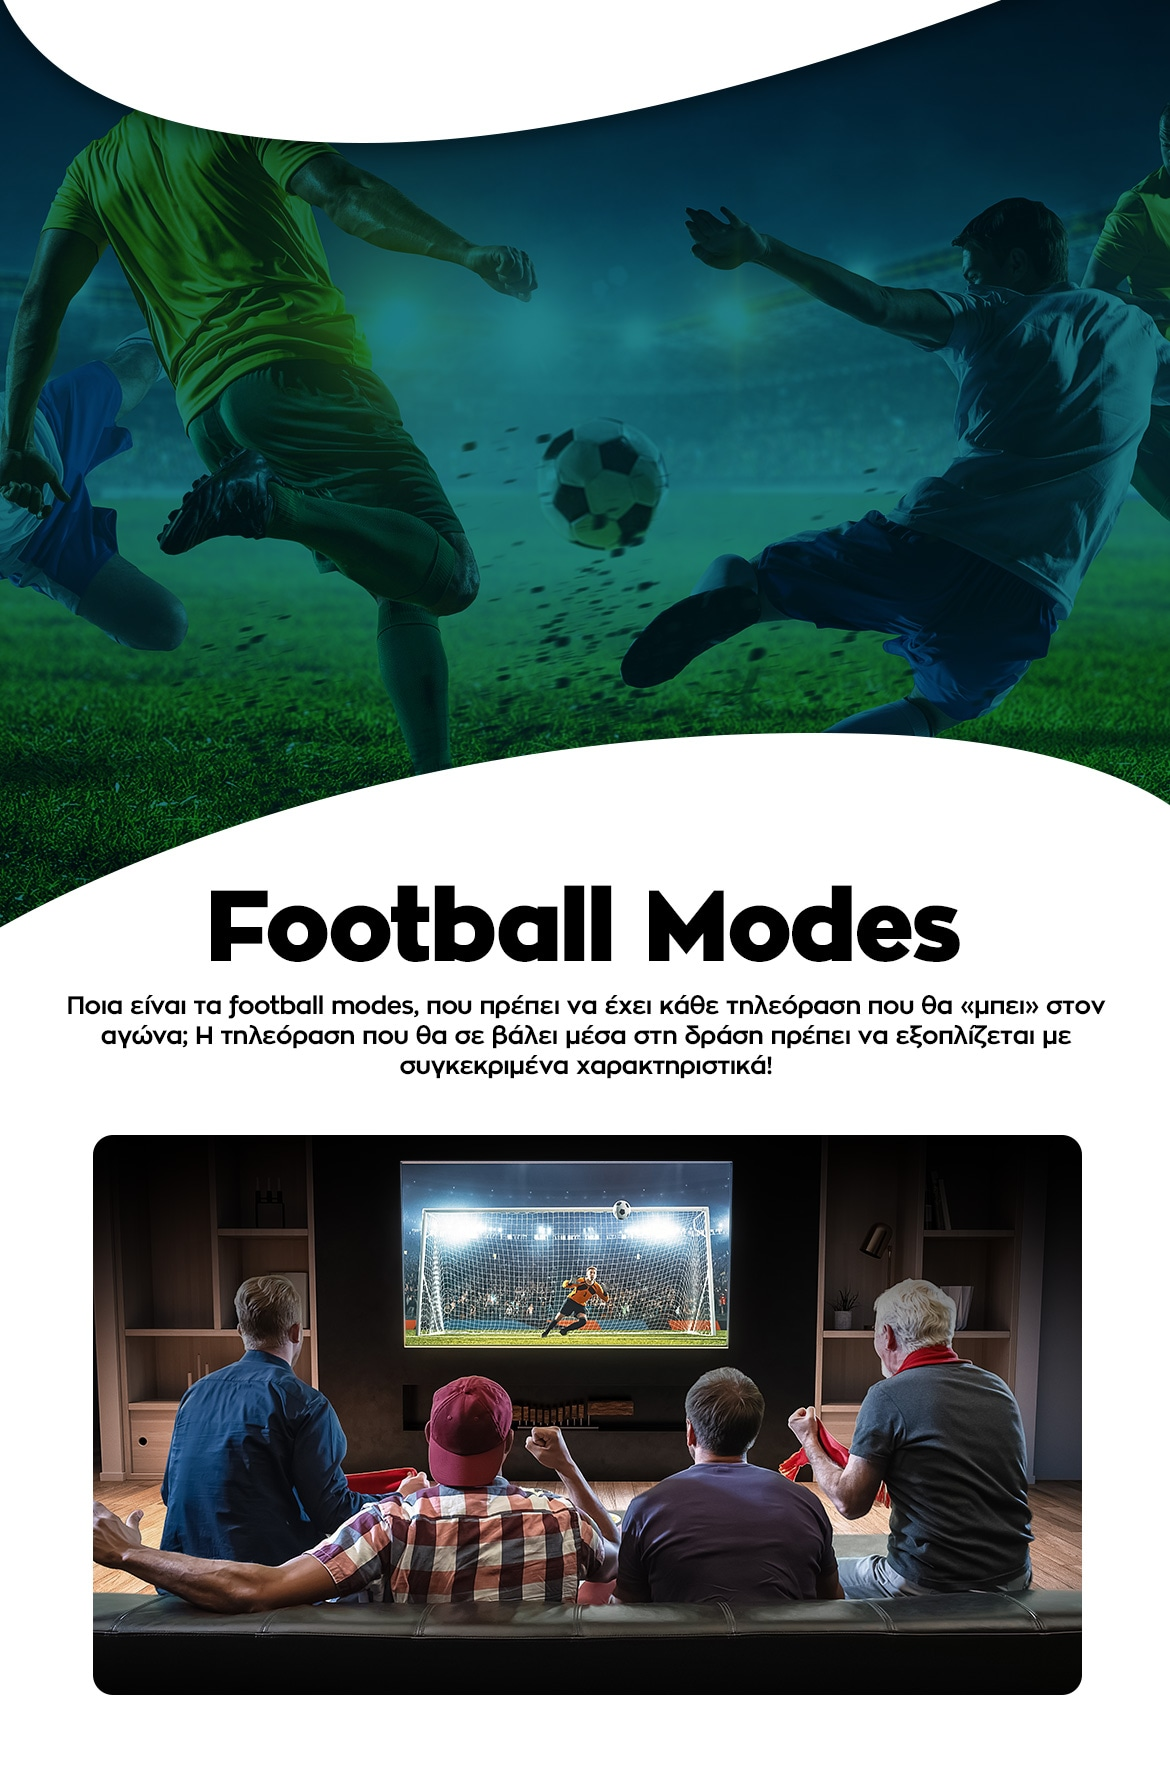 Football Modes